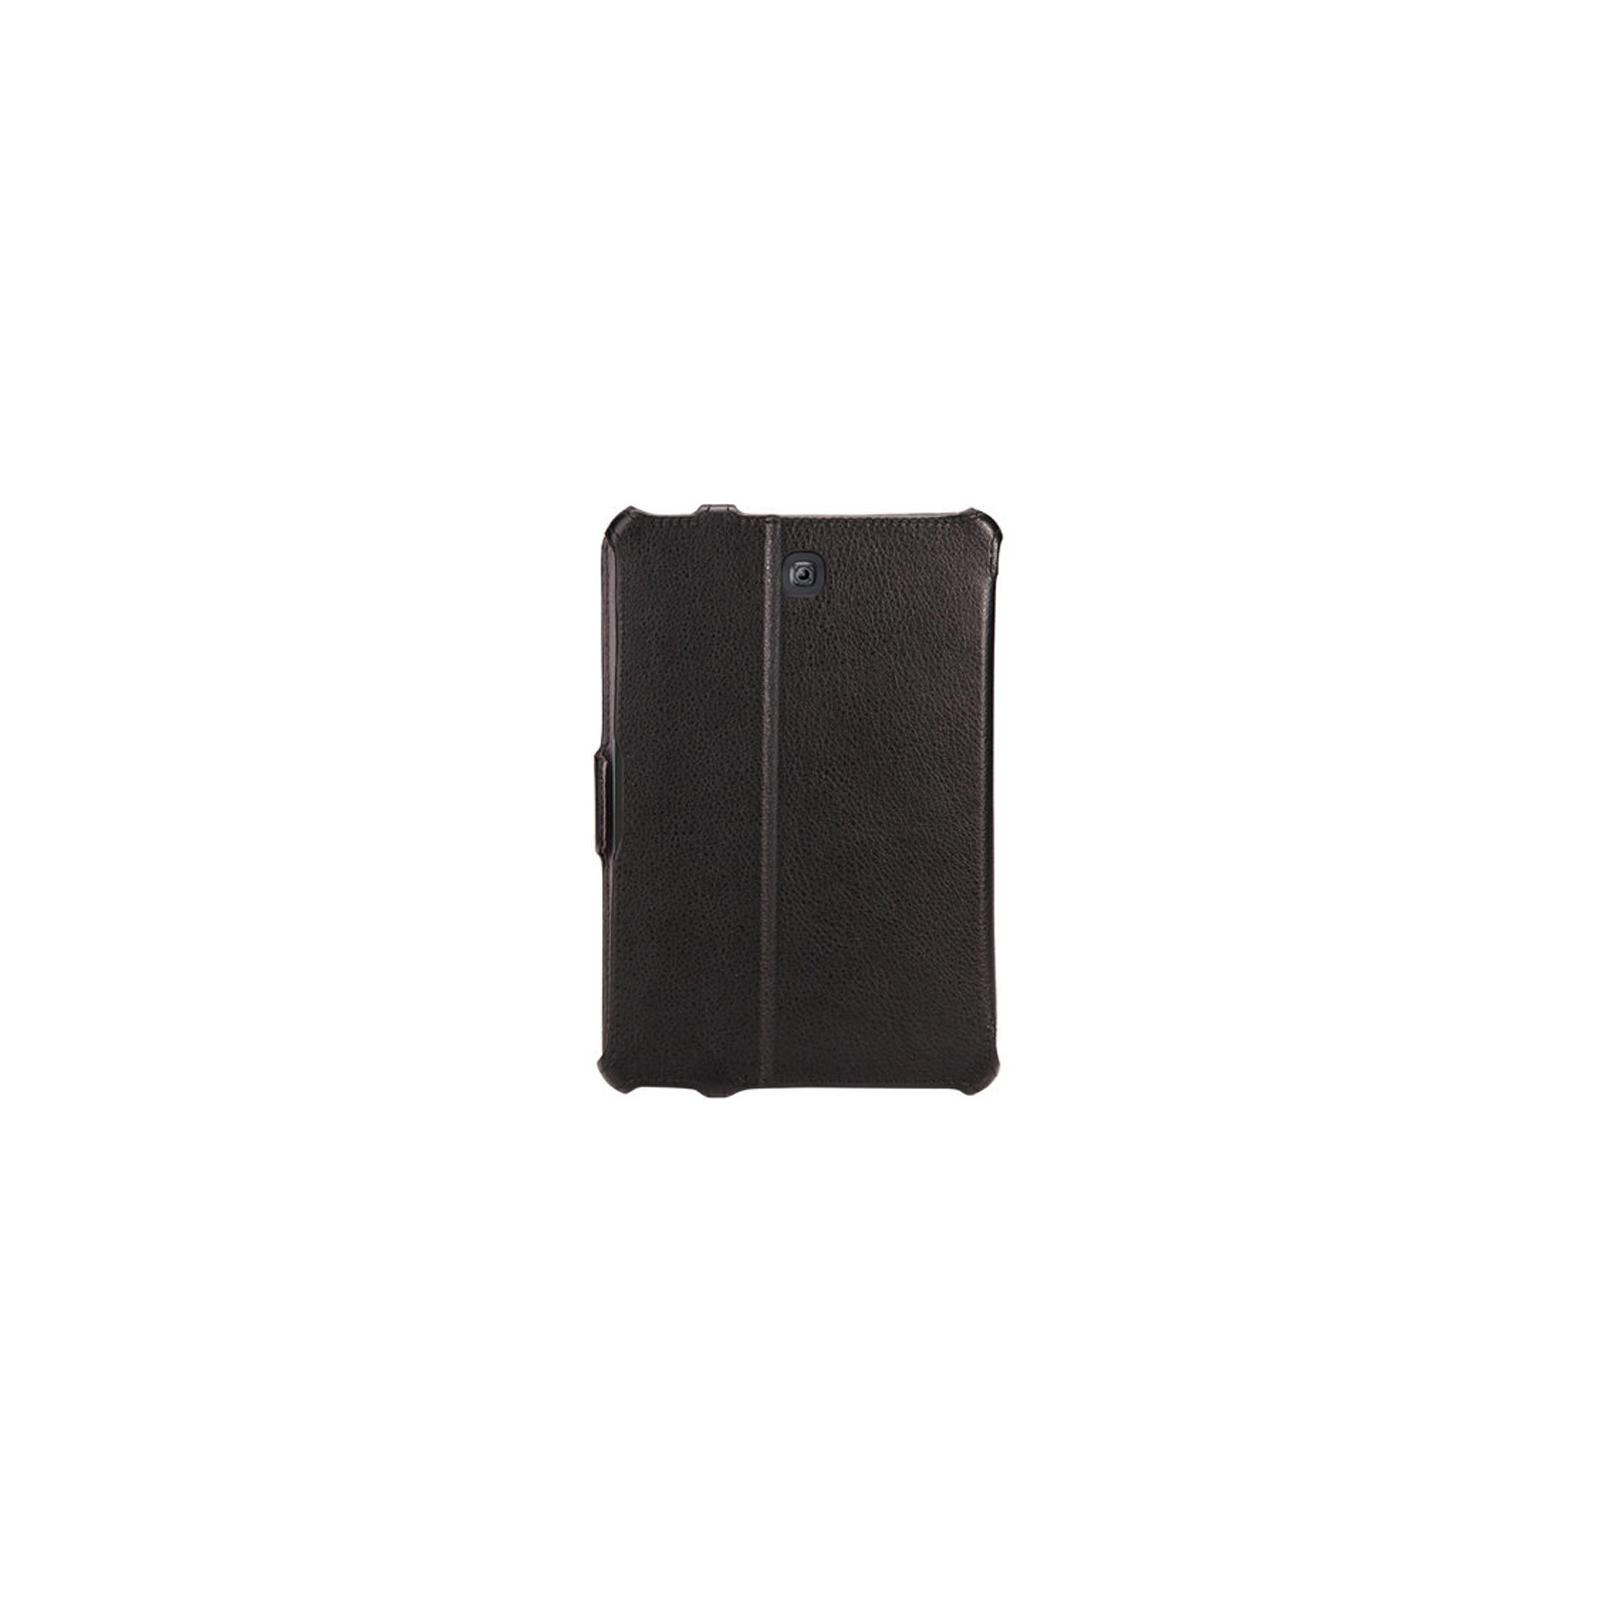 Чехол для планшета AirOn для Samsung Galaxy Tab S 2 8.0 black (4822352777418) изображение 2